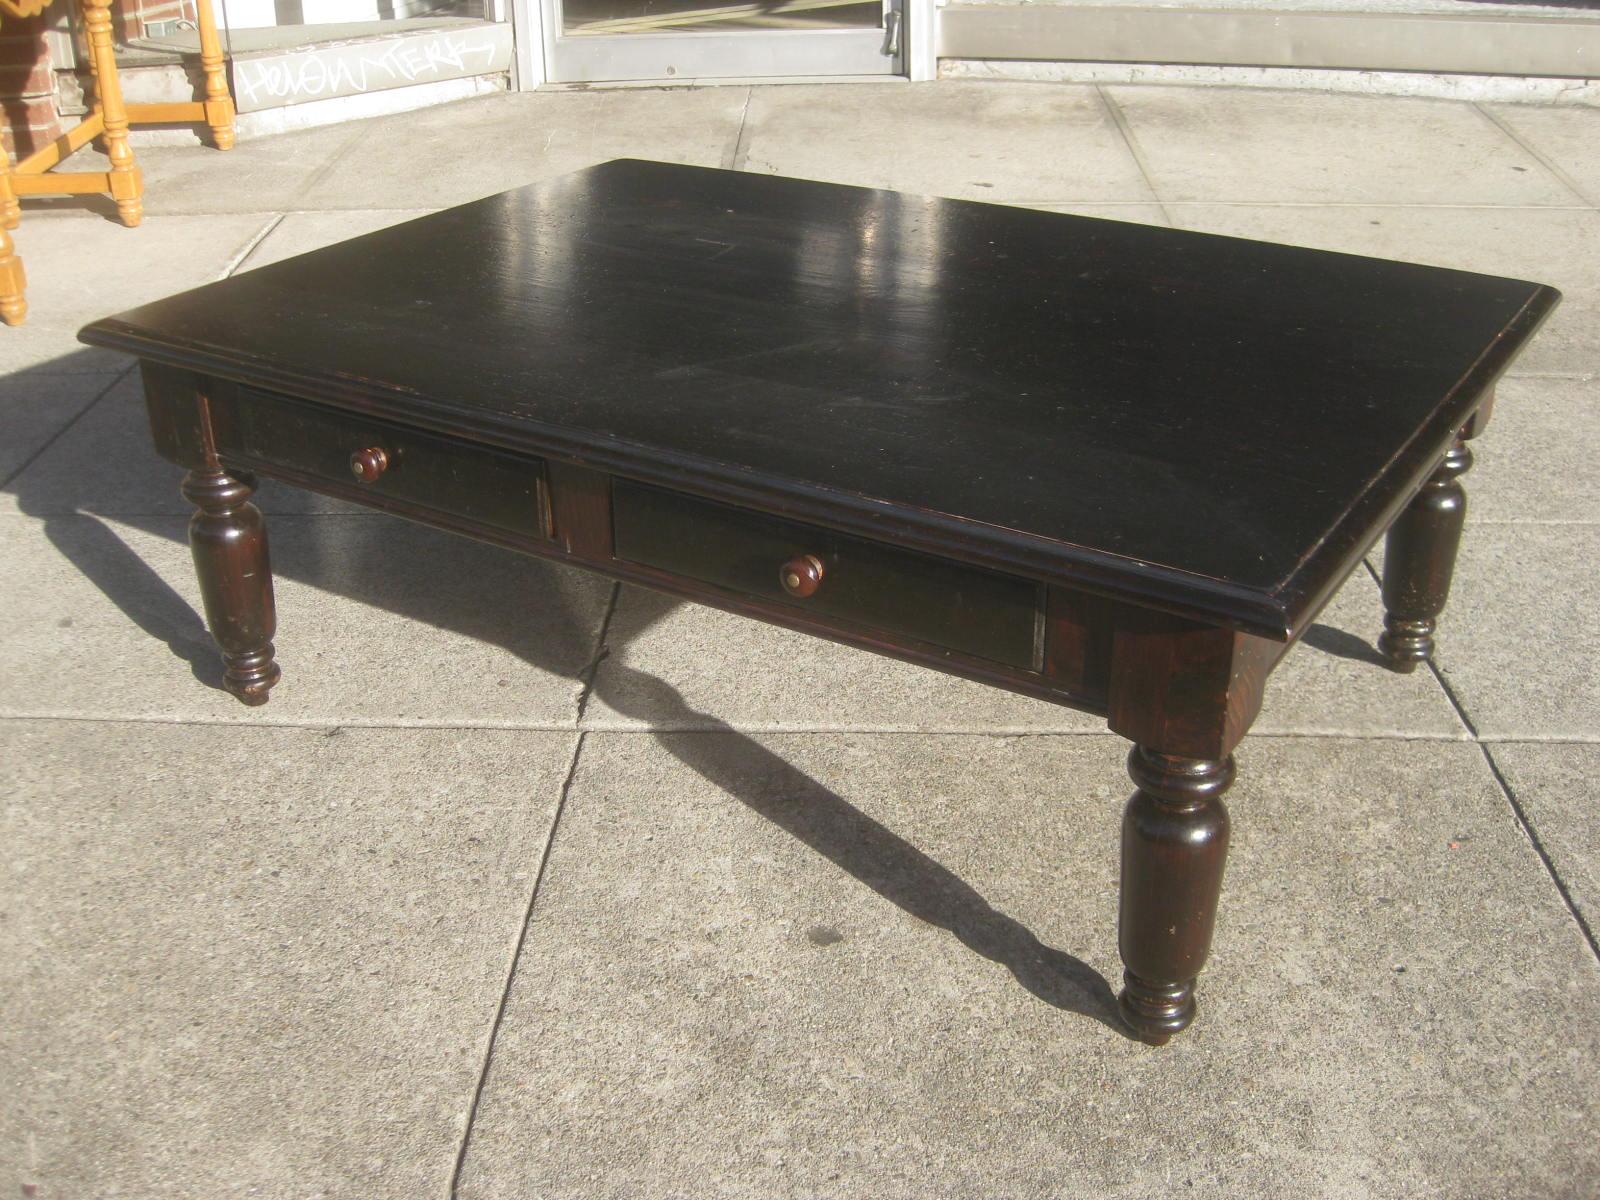 Uhuru Furniture Collectibles Sold Large Pine Coffee Table 95